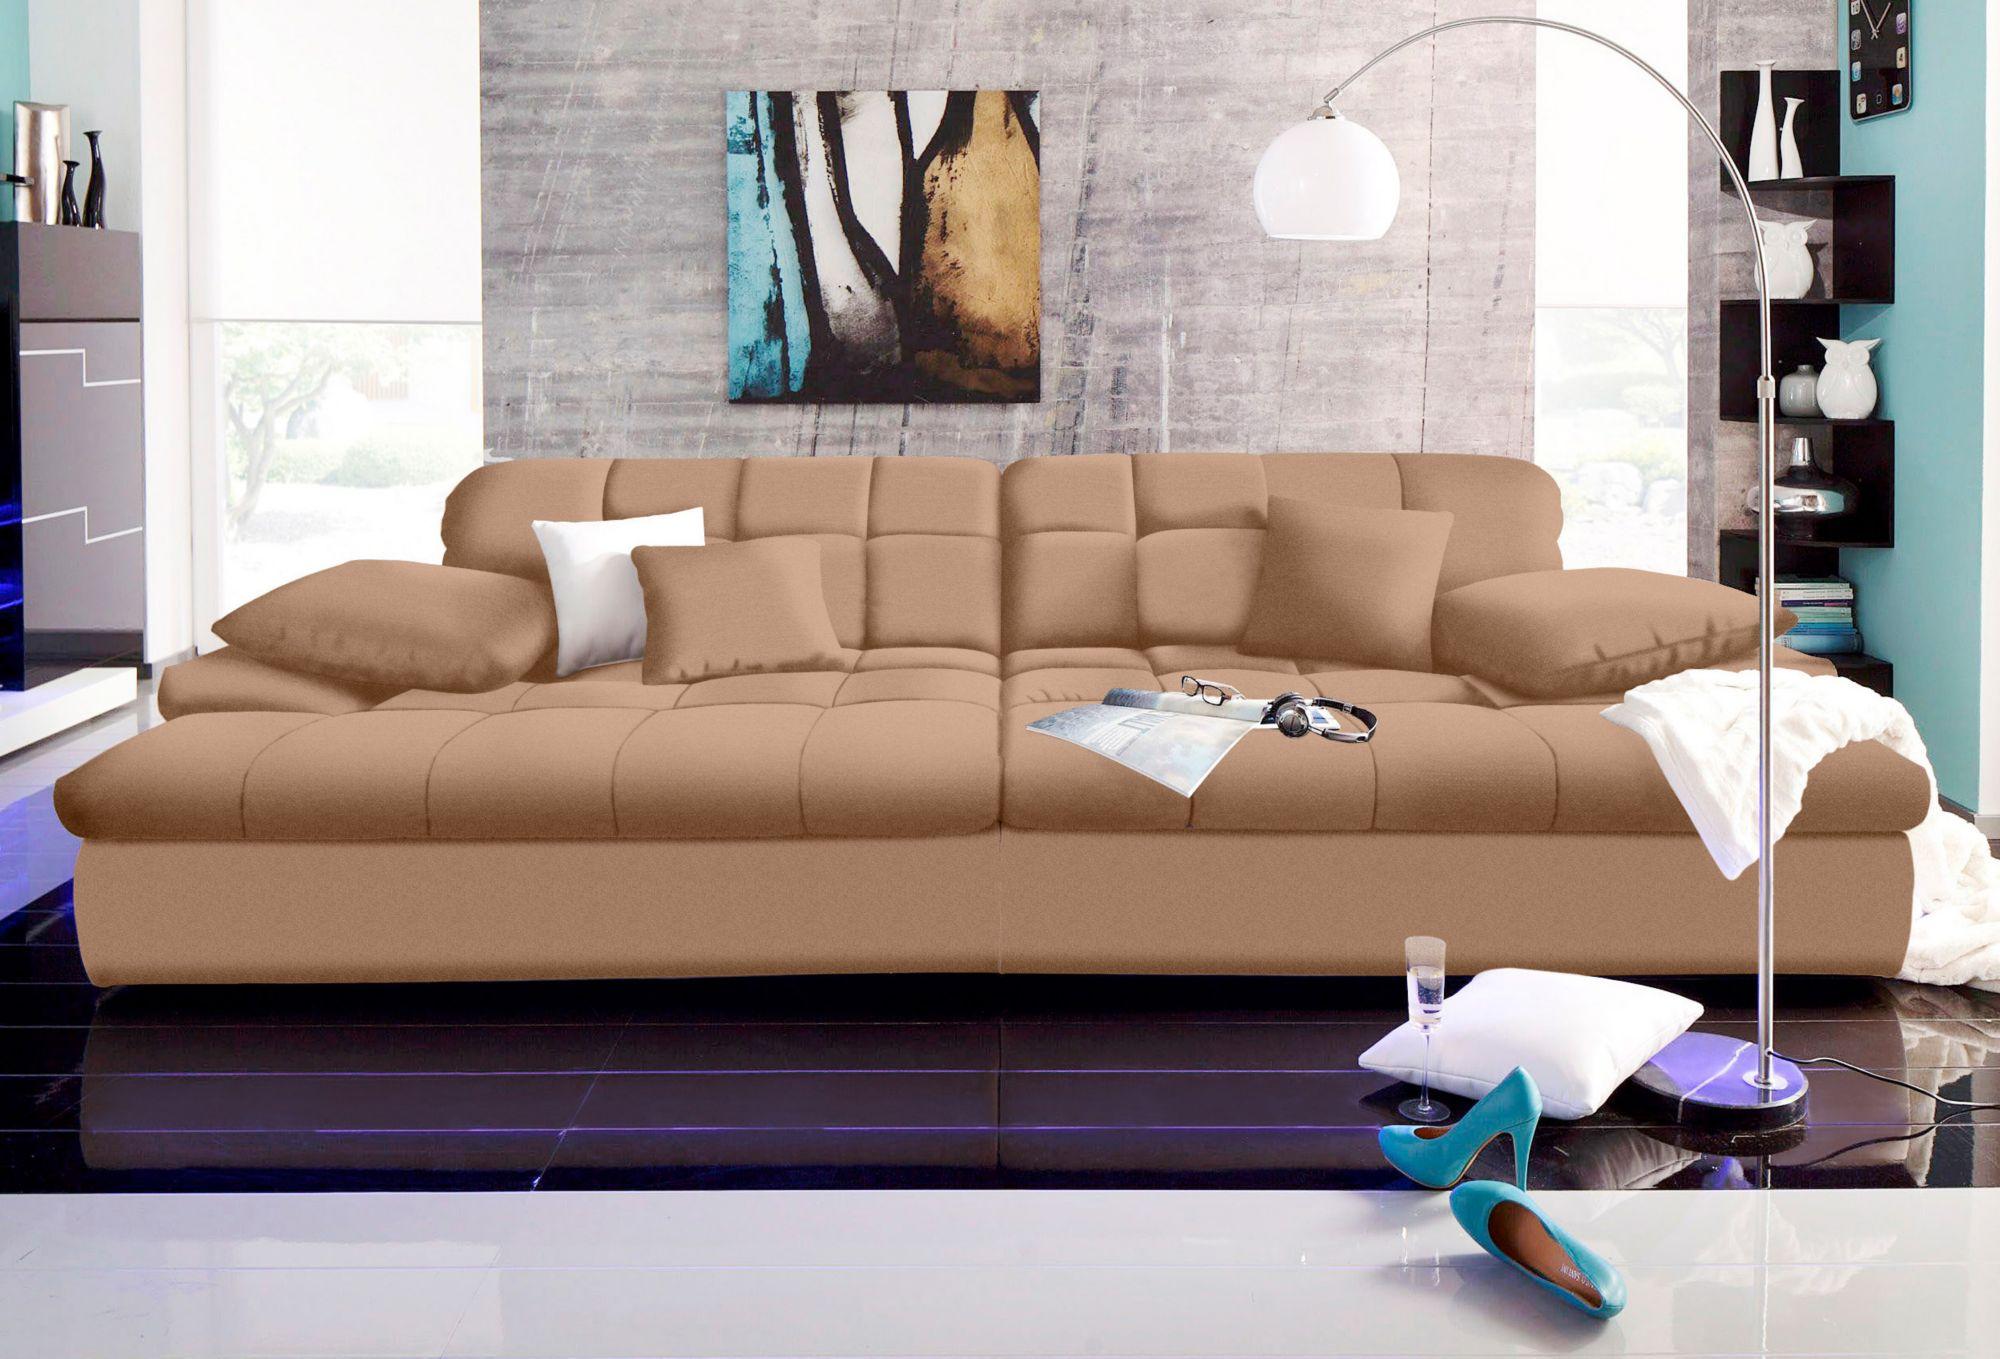 Big sofa schwab versand sofas mit led Sofa primabelle